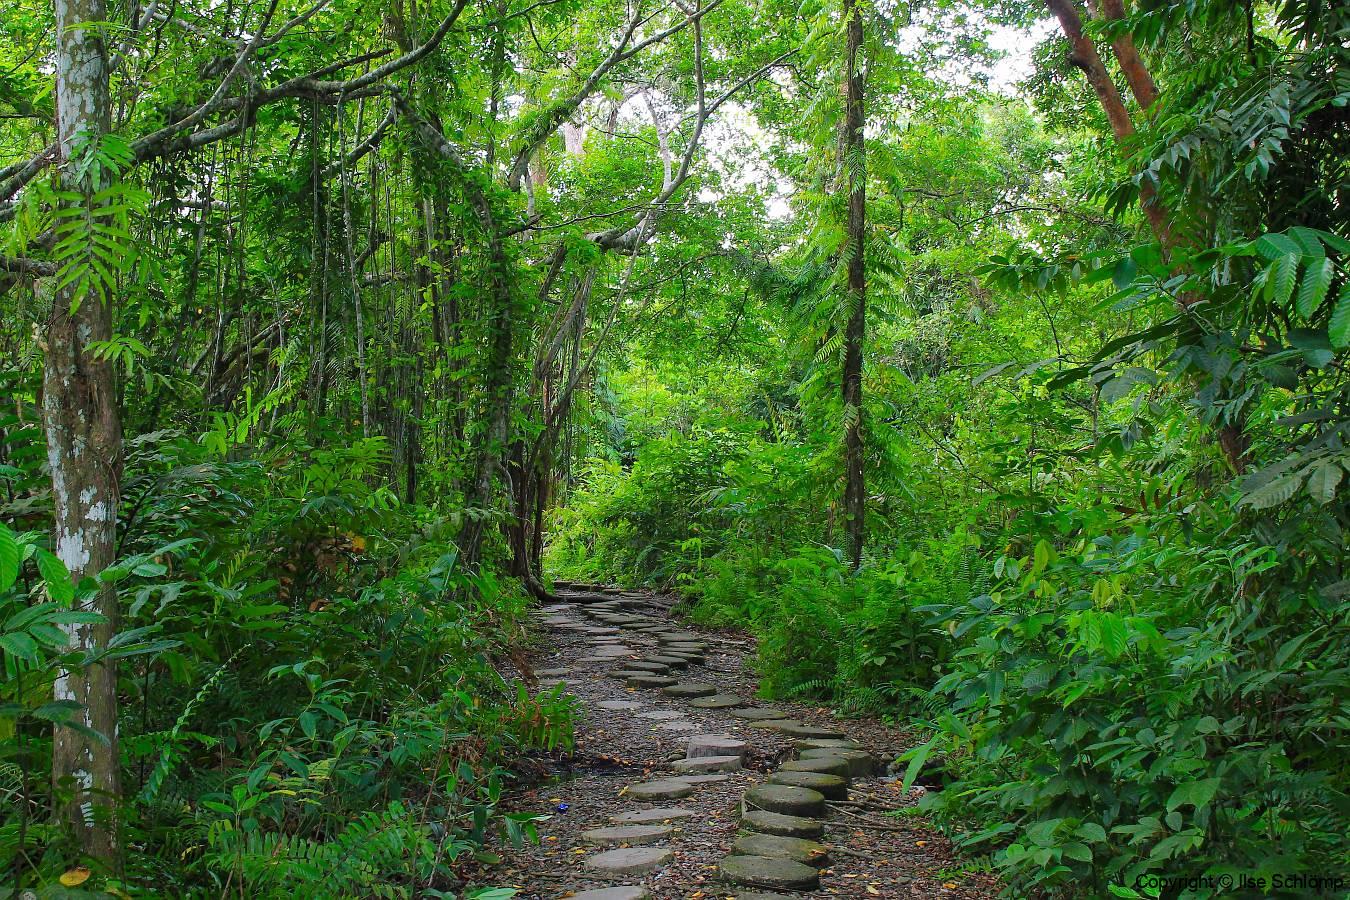 Indonesien, Sumatra, Regenwald Umgebung Bukittinggi